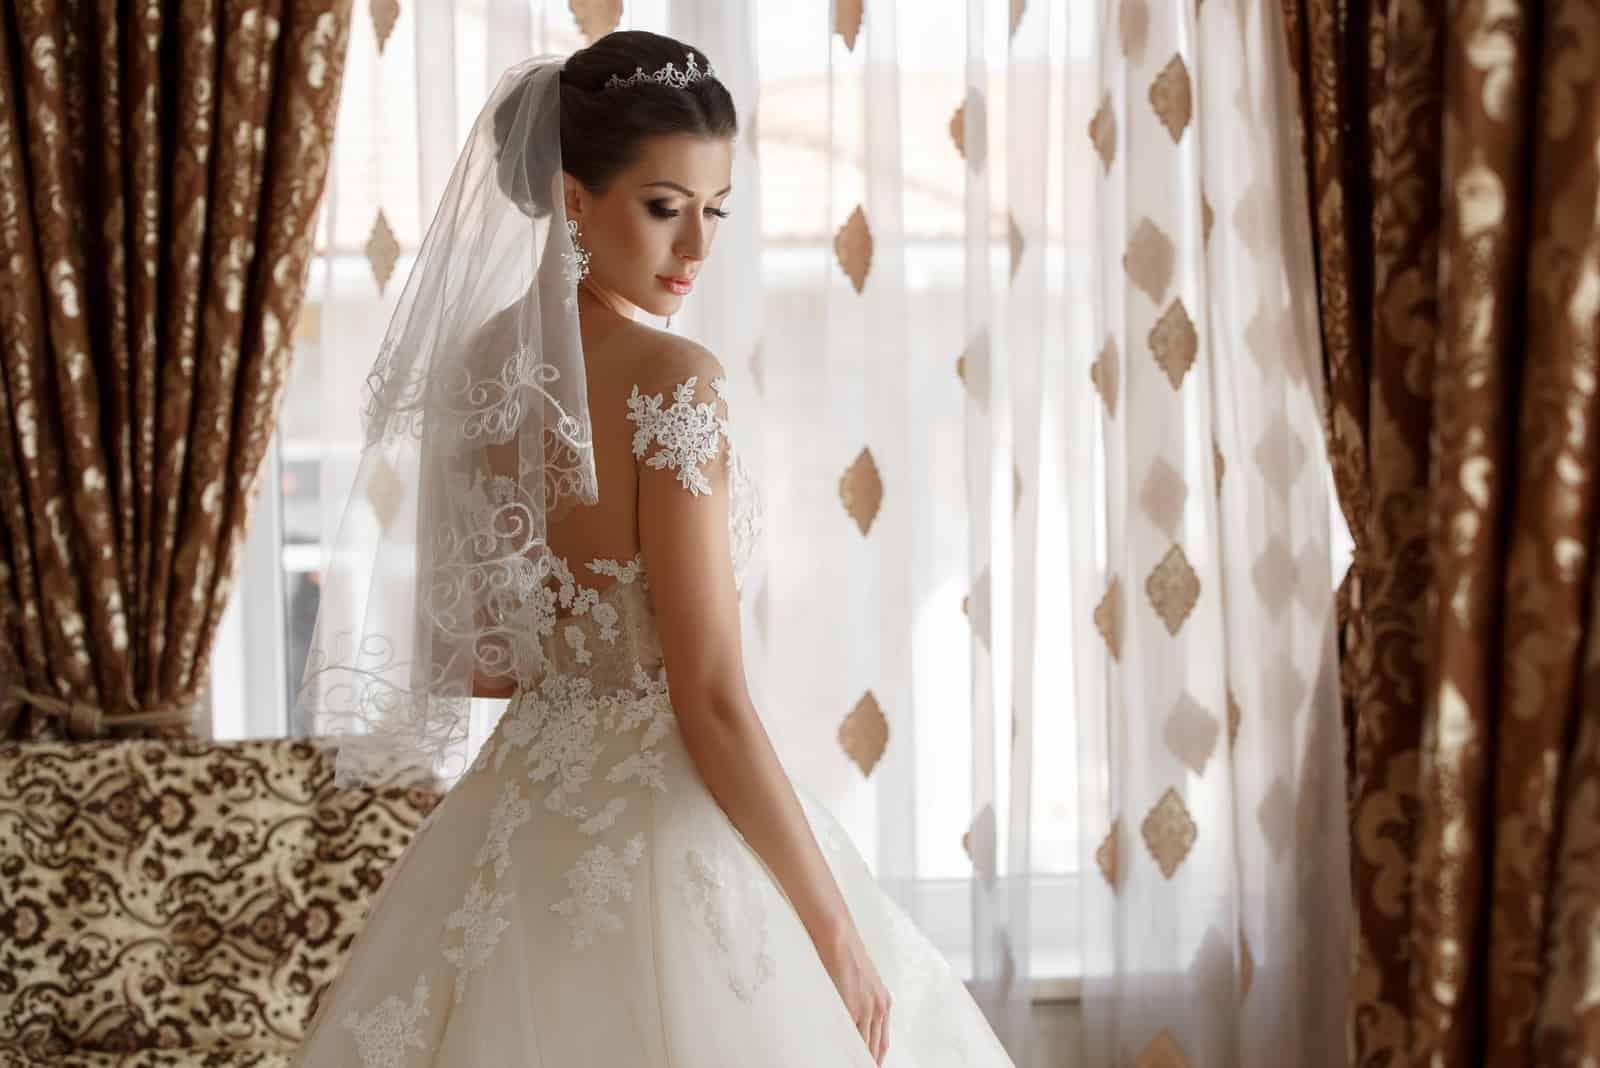 Schönes Brautporträt